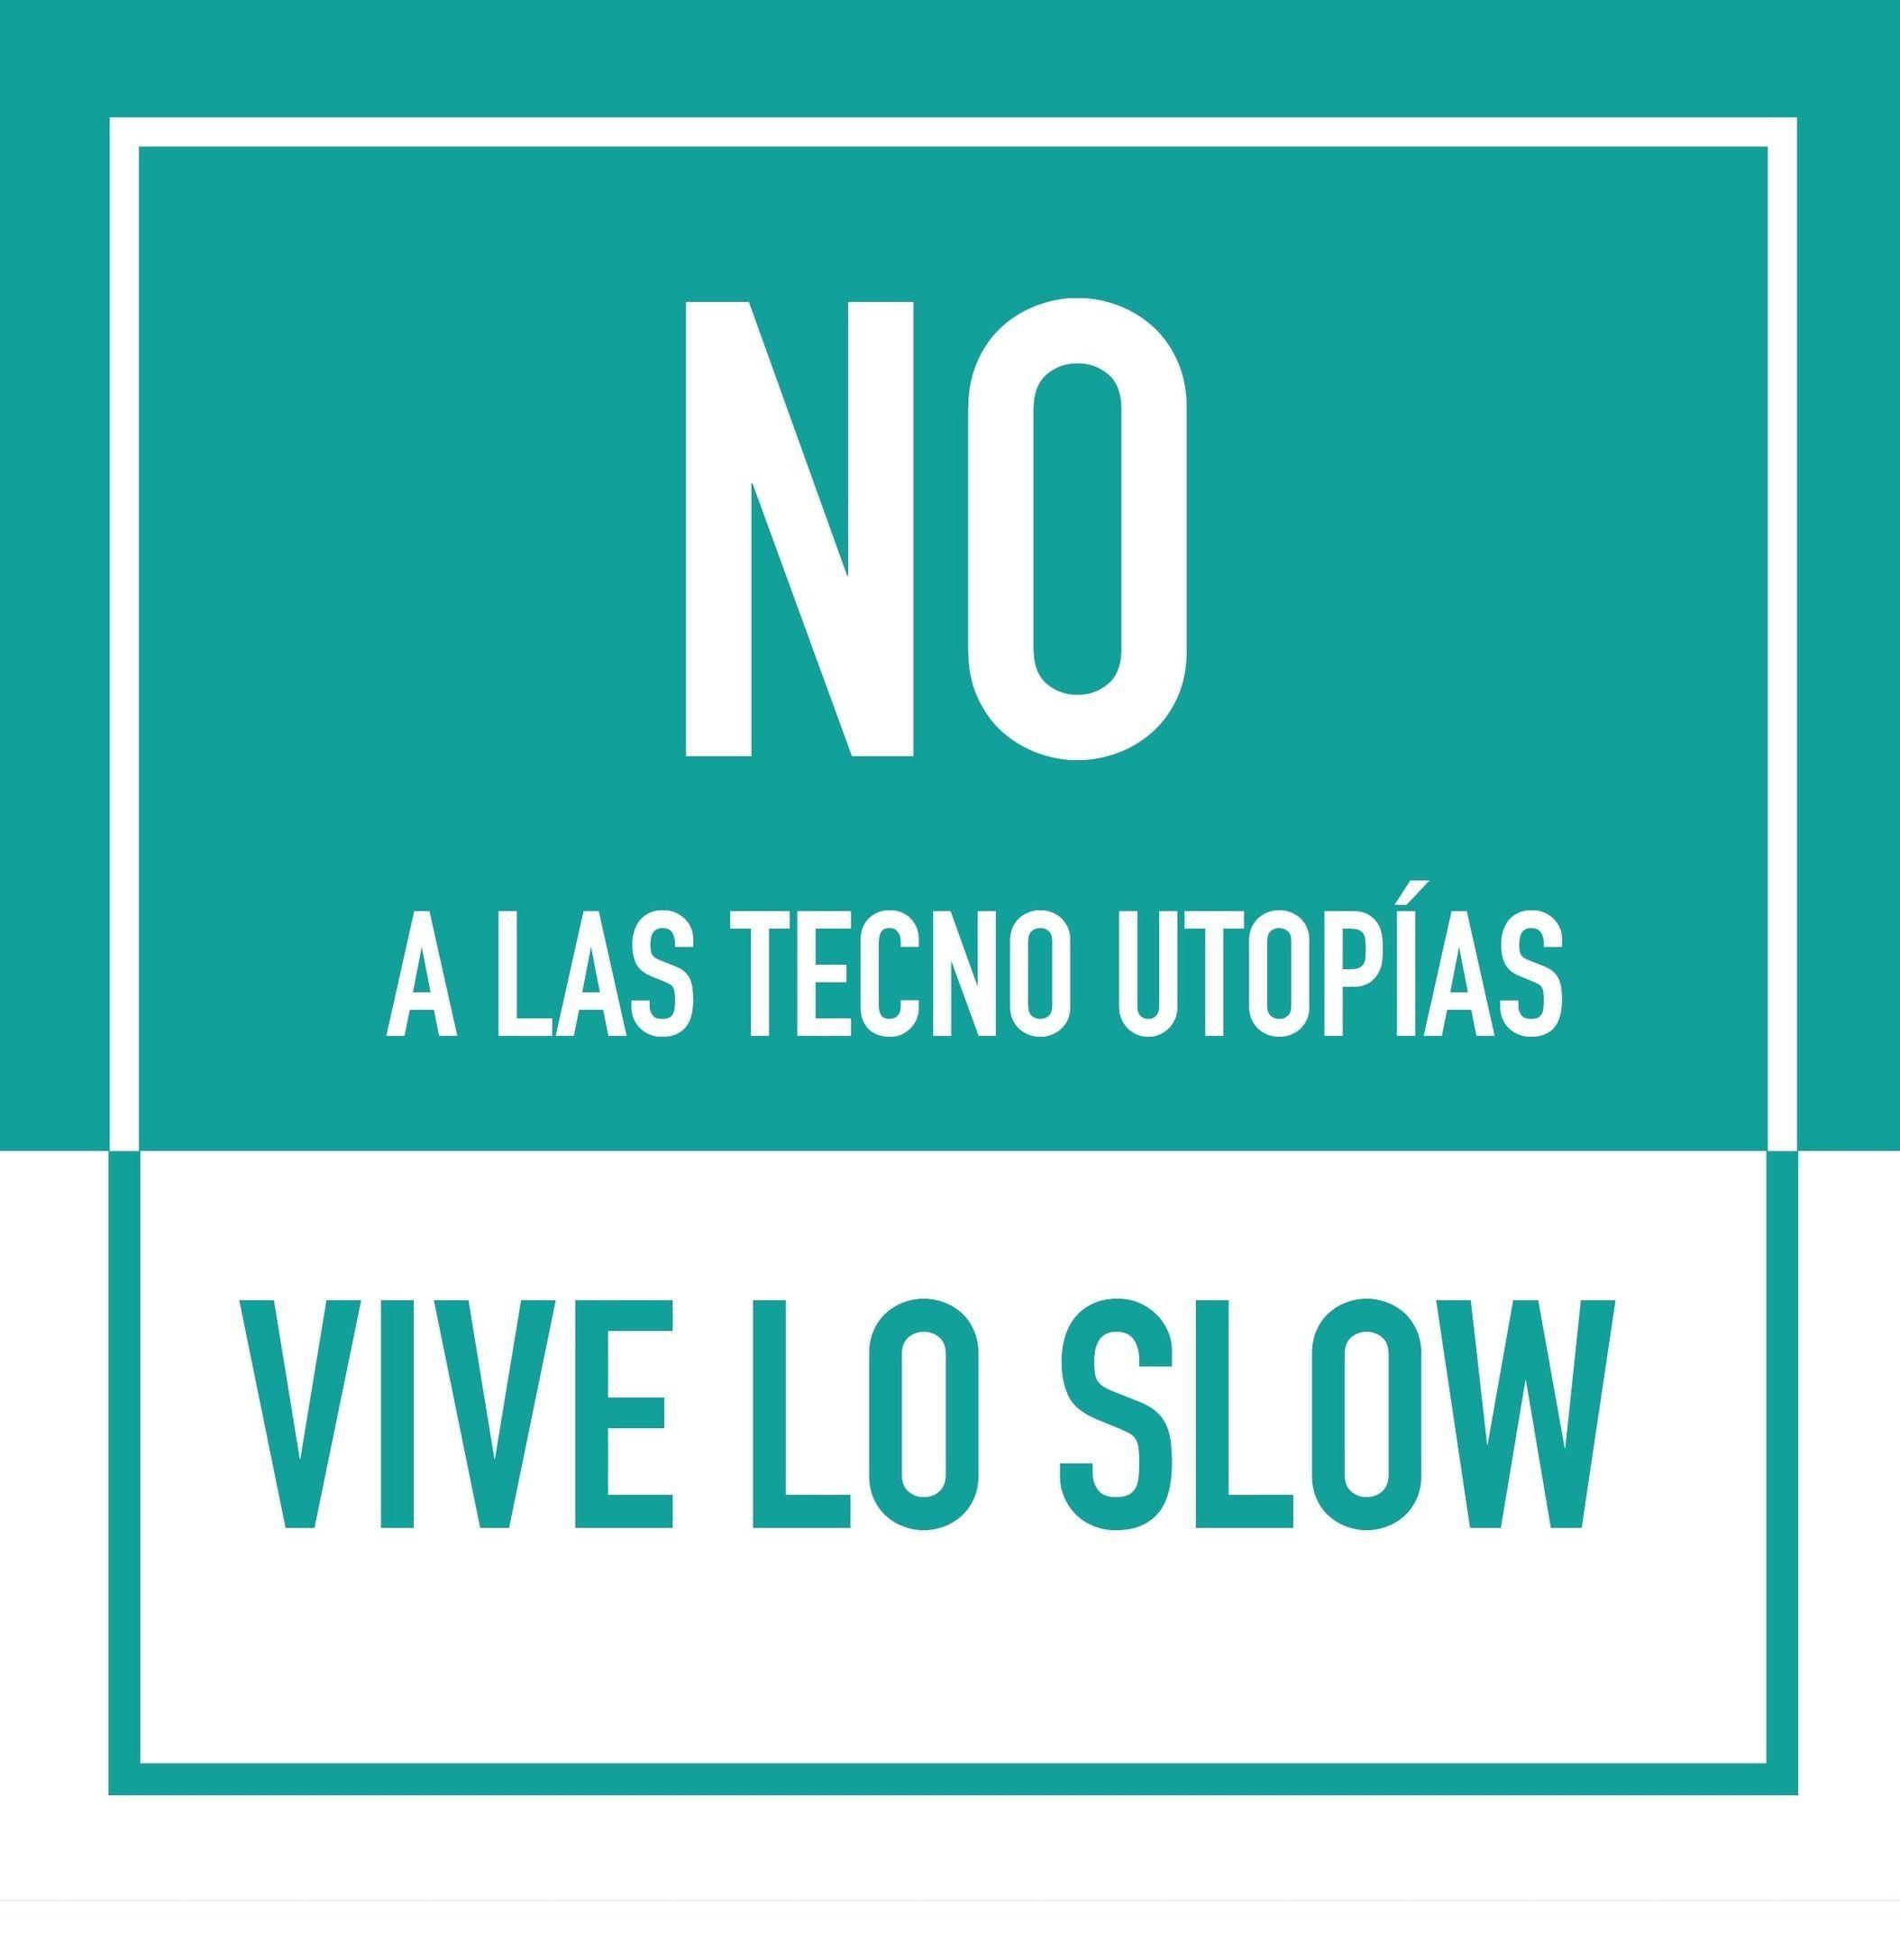 Las TRIC en el entorno slow http://sco.lt/... #TRIC #TIC #e-learning